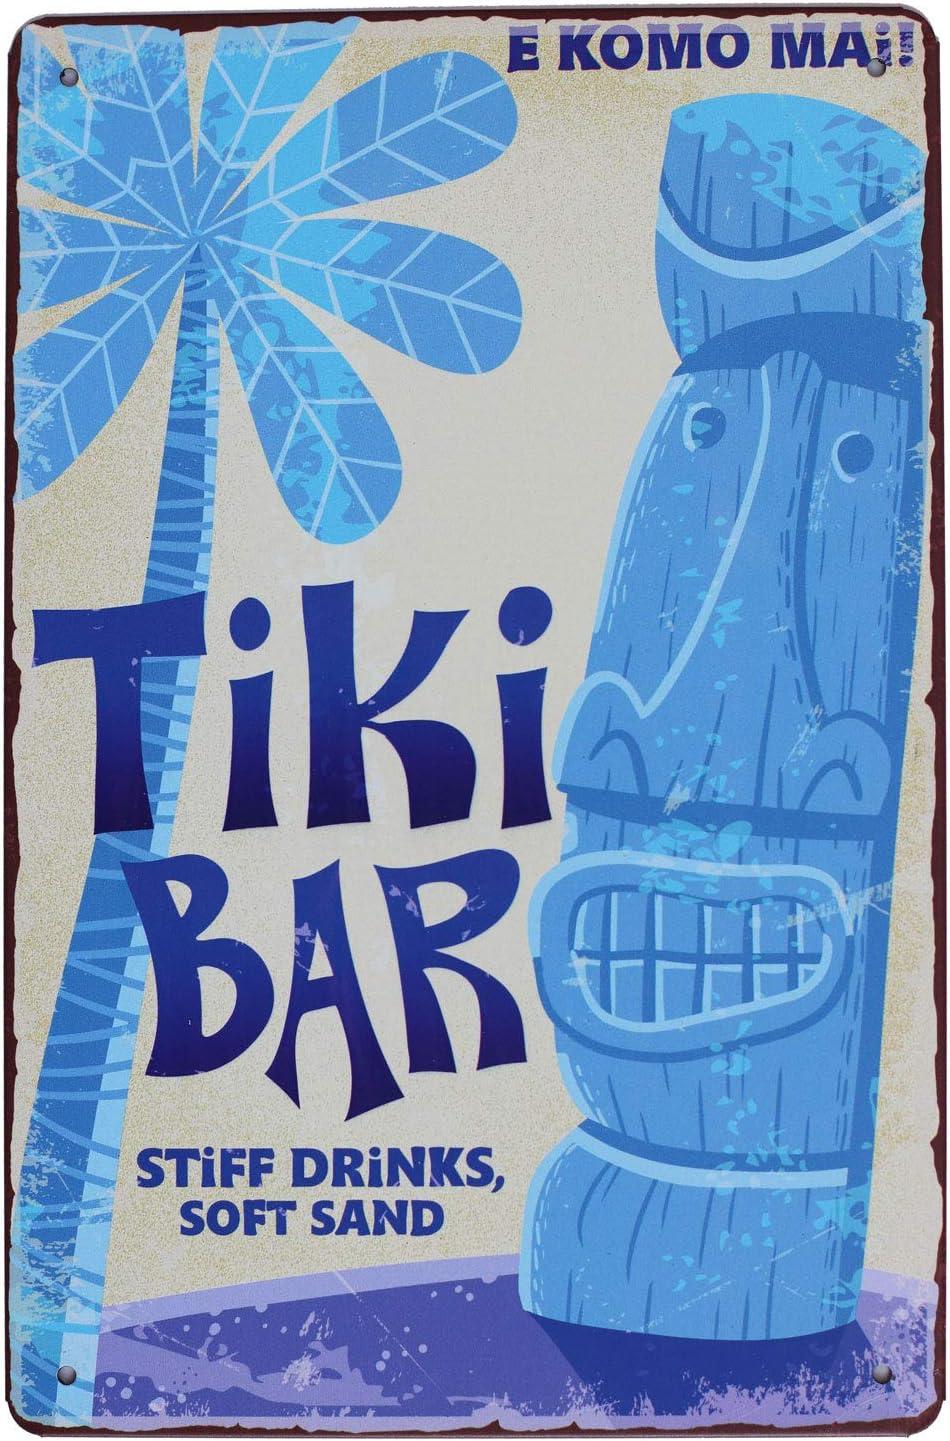 SUMIK Tiki BAR Stiff Drinks Soft Sand Art Poster Vintage Metal Sign Retro Wall Decor